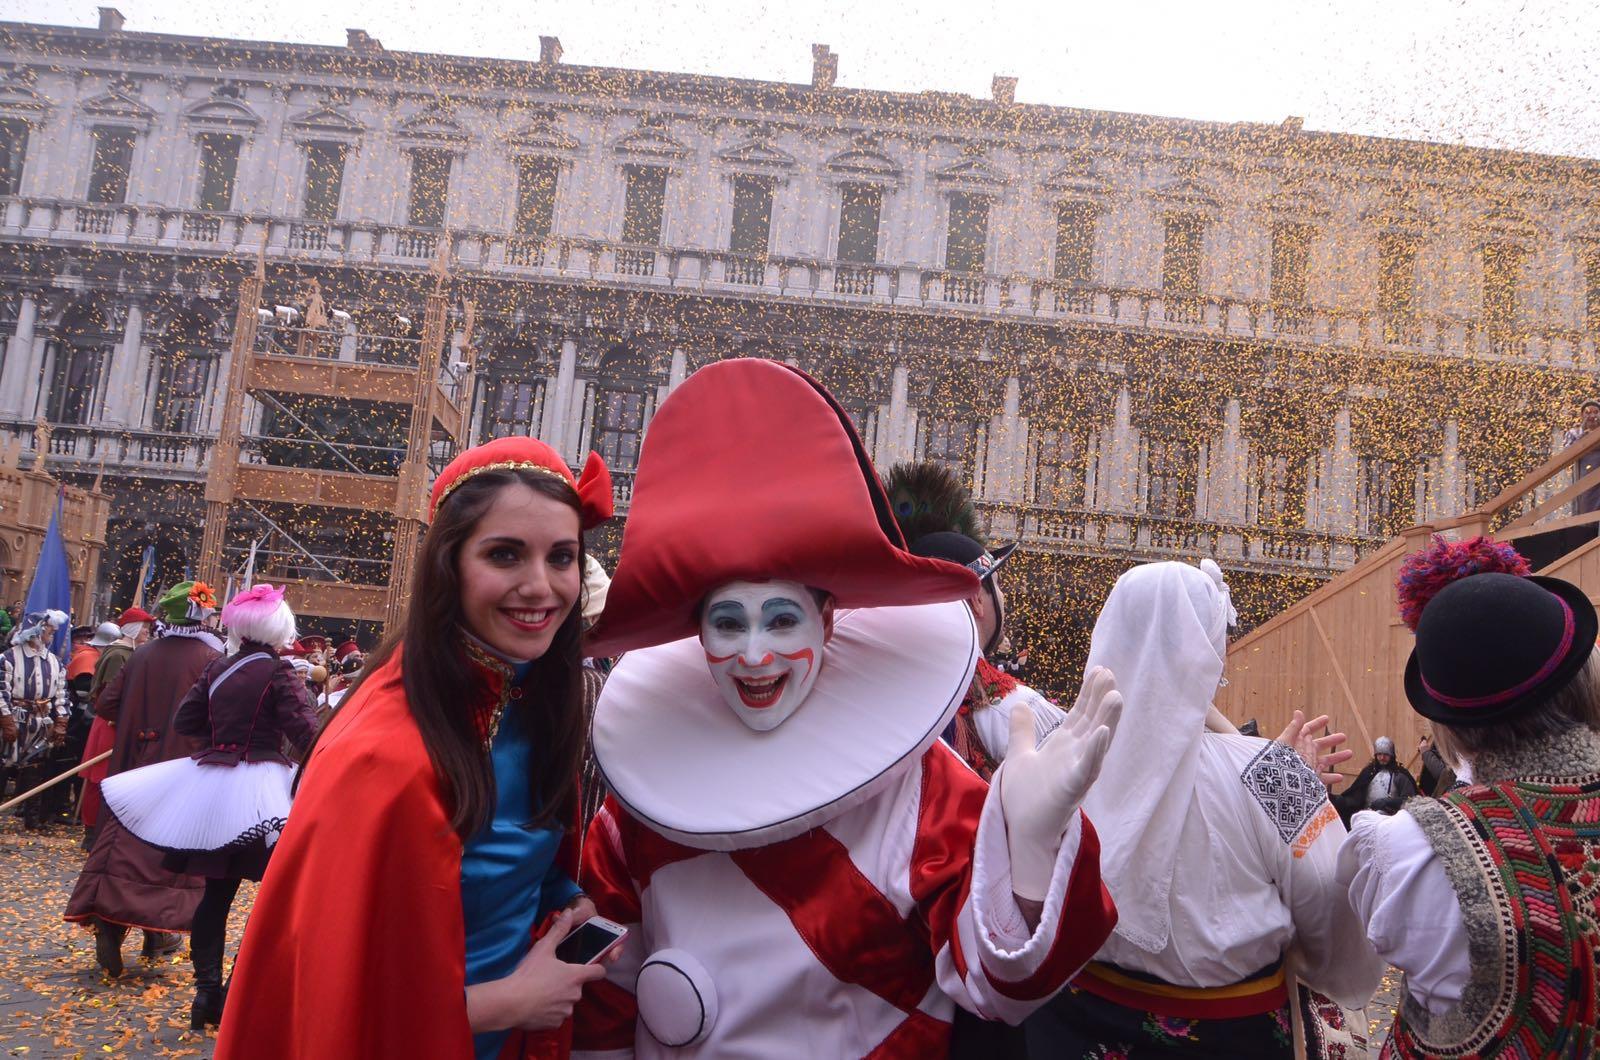 Burlamacco e Ondina in trasferta a Venezia